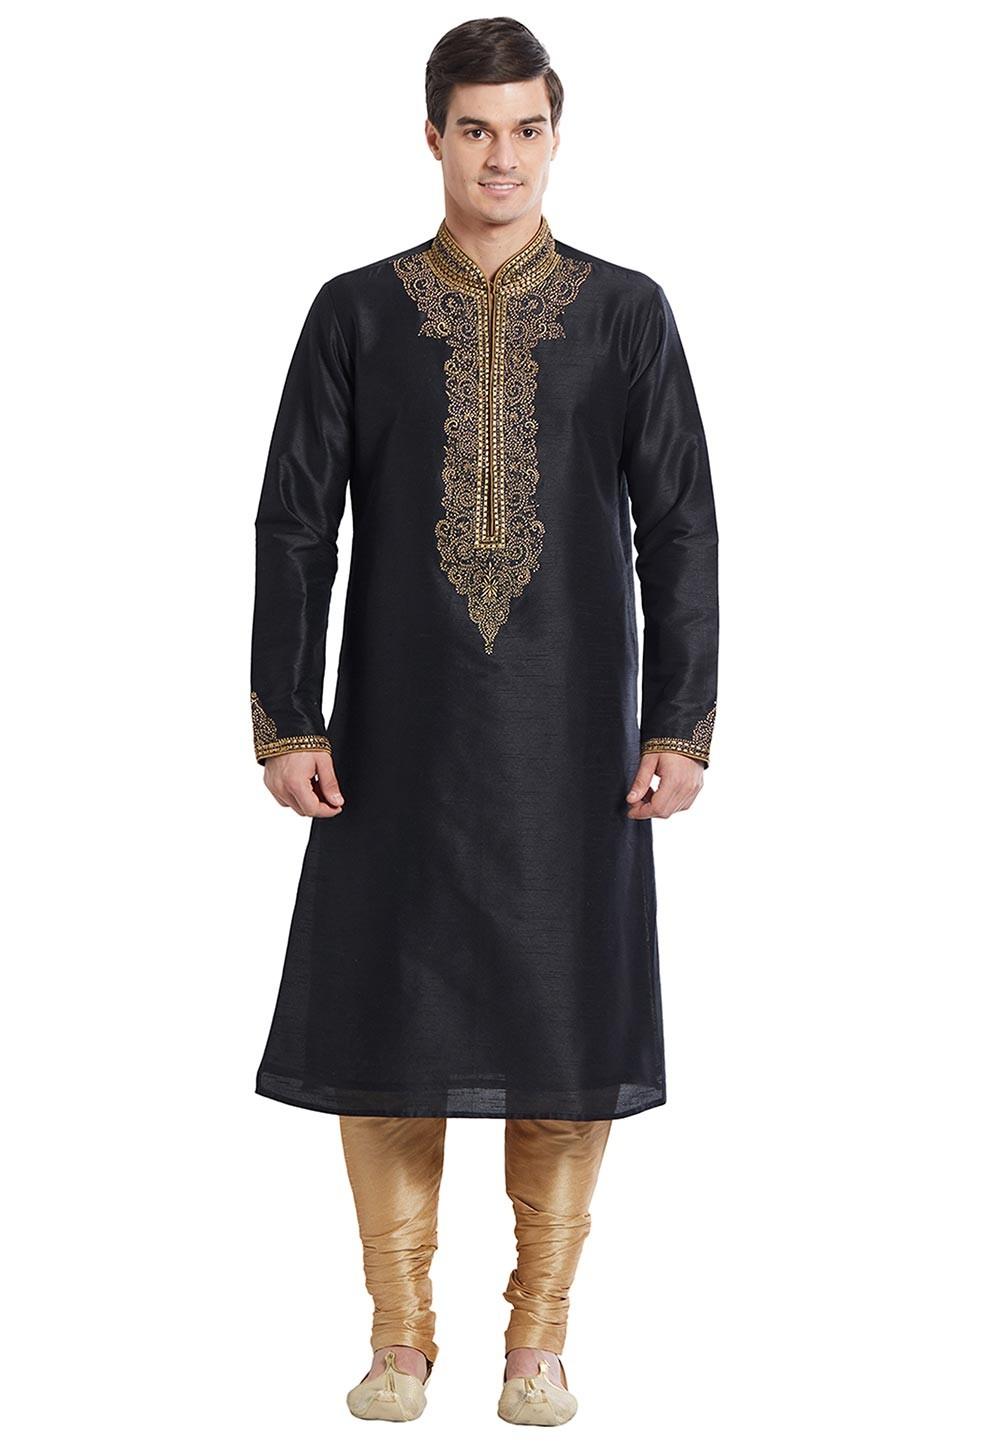 Black Color Silk Fabric Designer Kurta Pajama With Zari Work